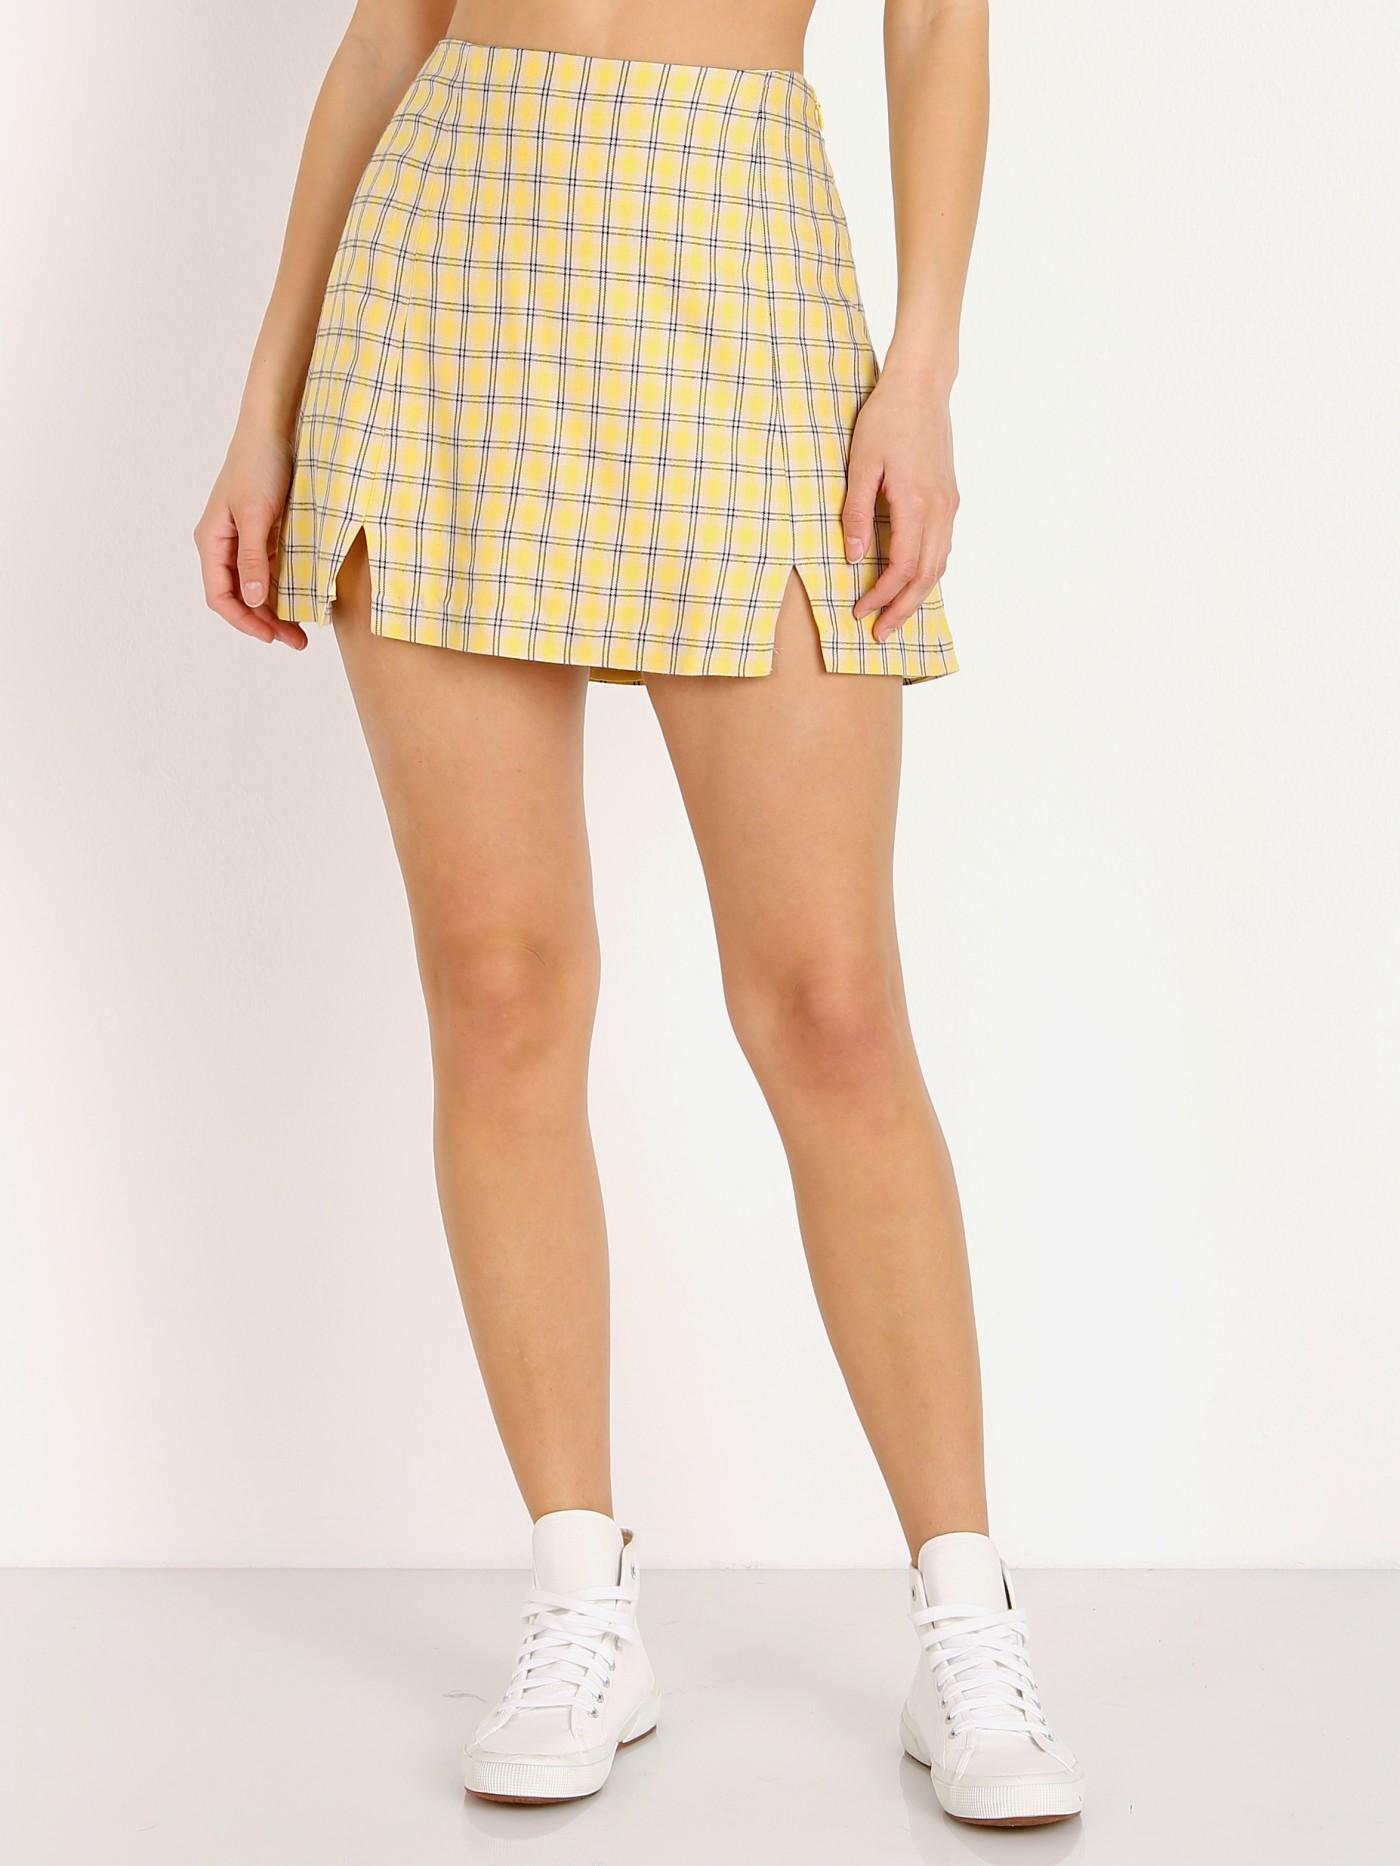 e8af694e6a Capulet Rosa Mini Skirt Yellow Plaid S407 - Free Shipping at Largo Drive